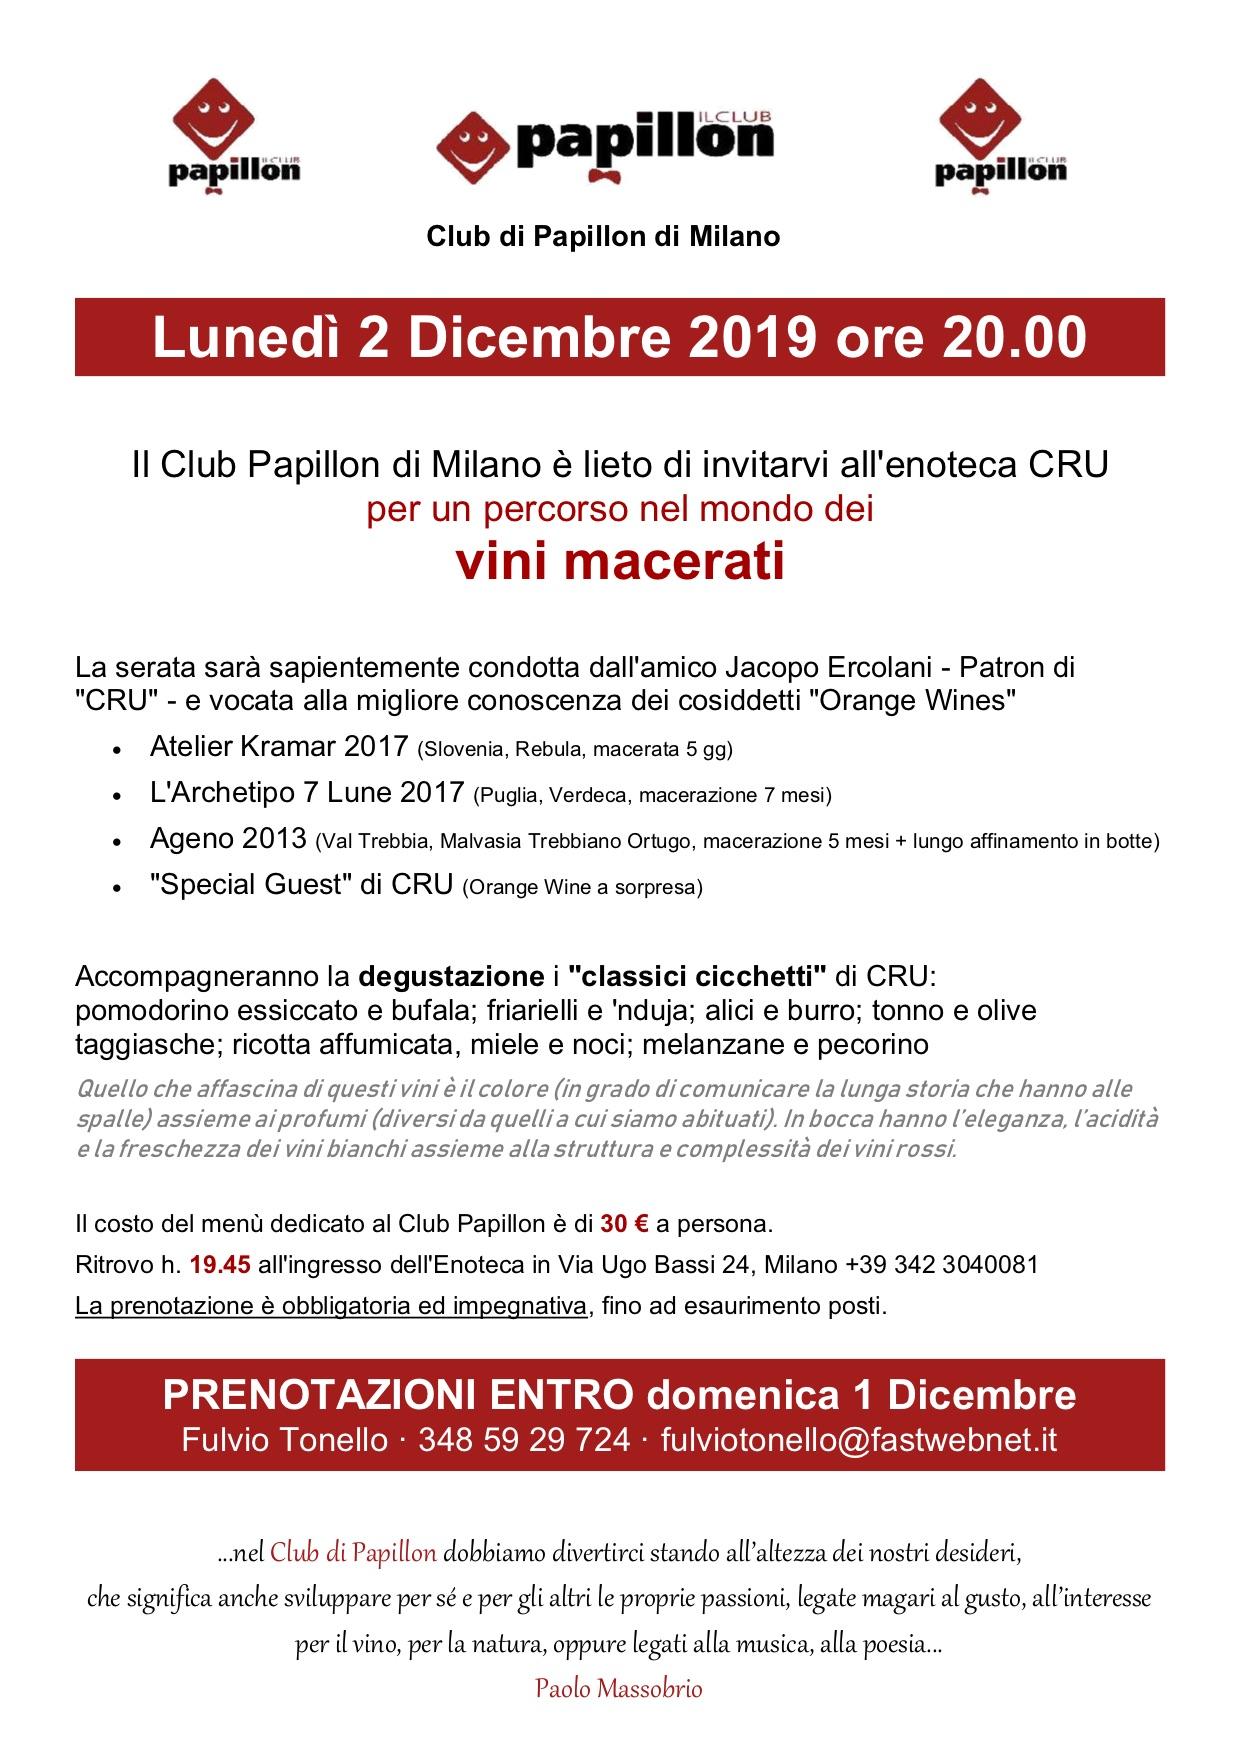 03.12.19 Serata CRU Papillon.jpg